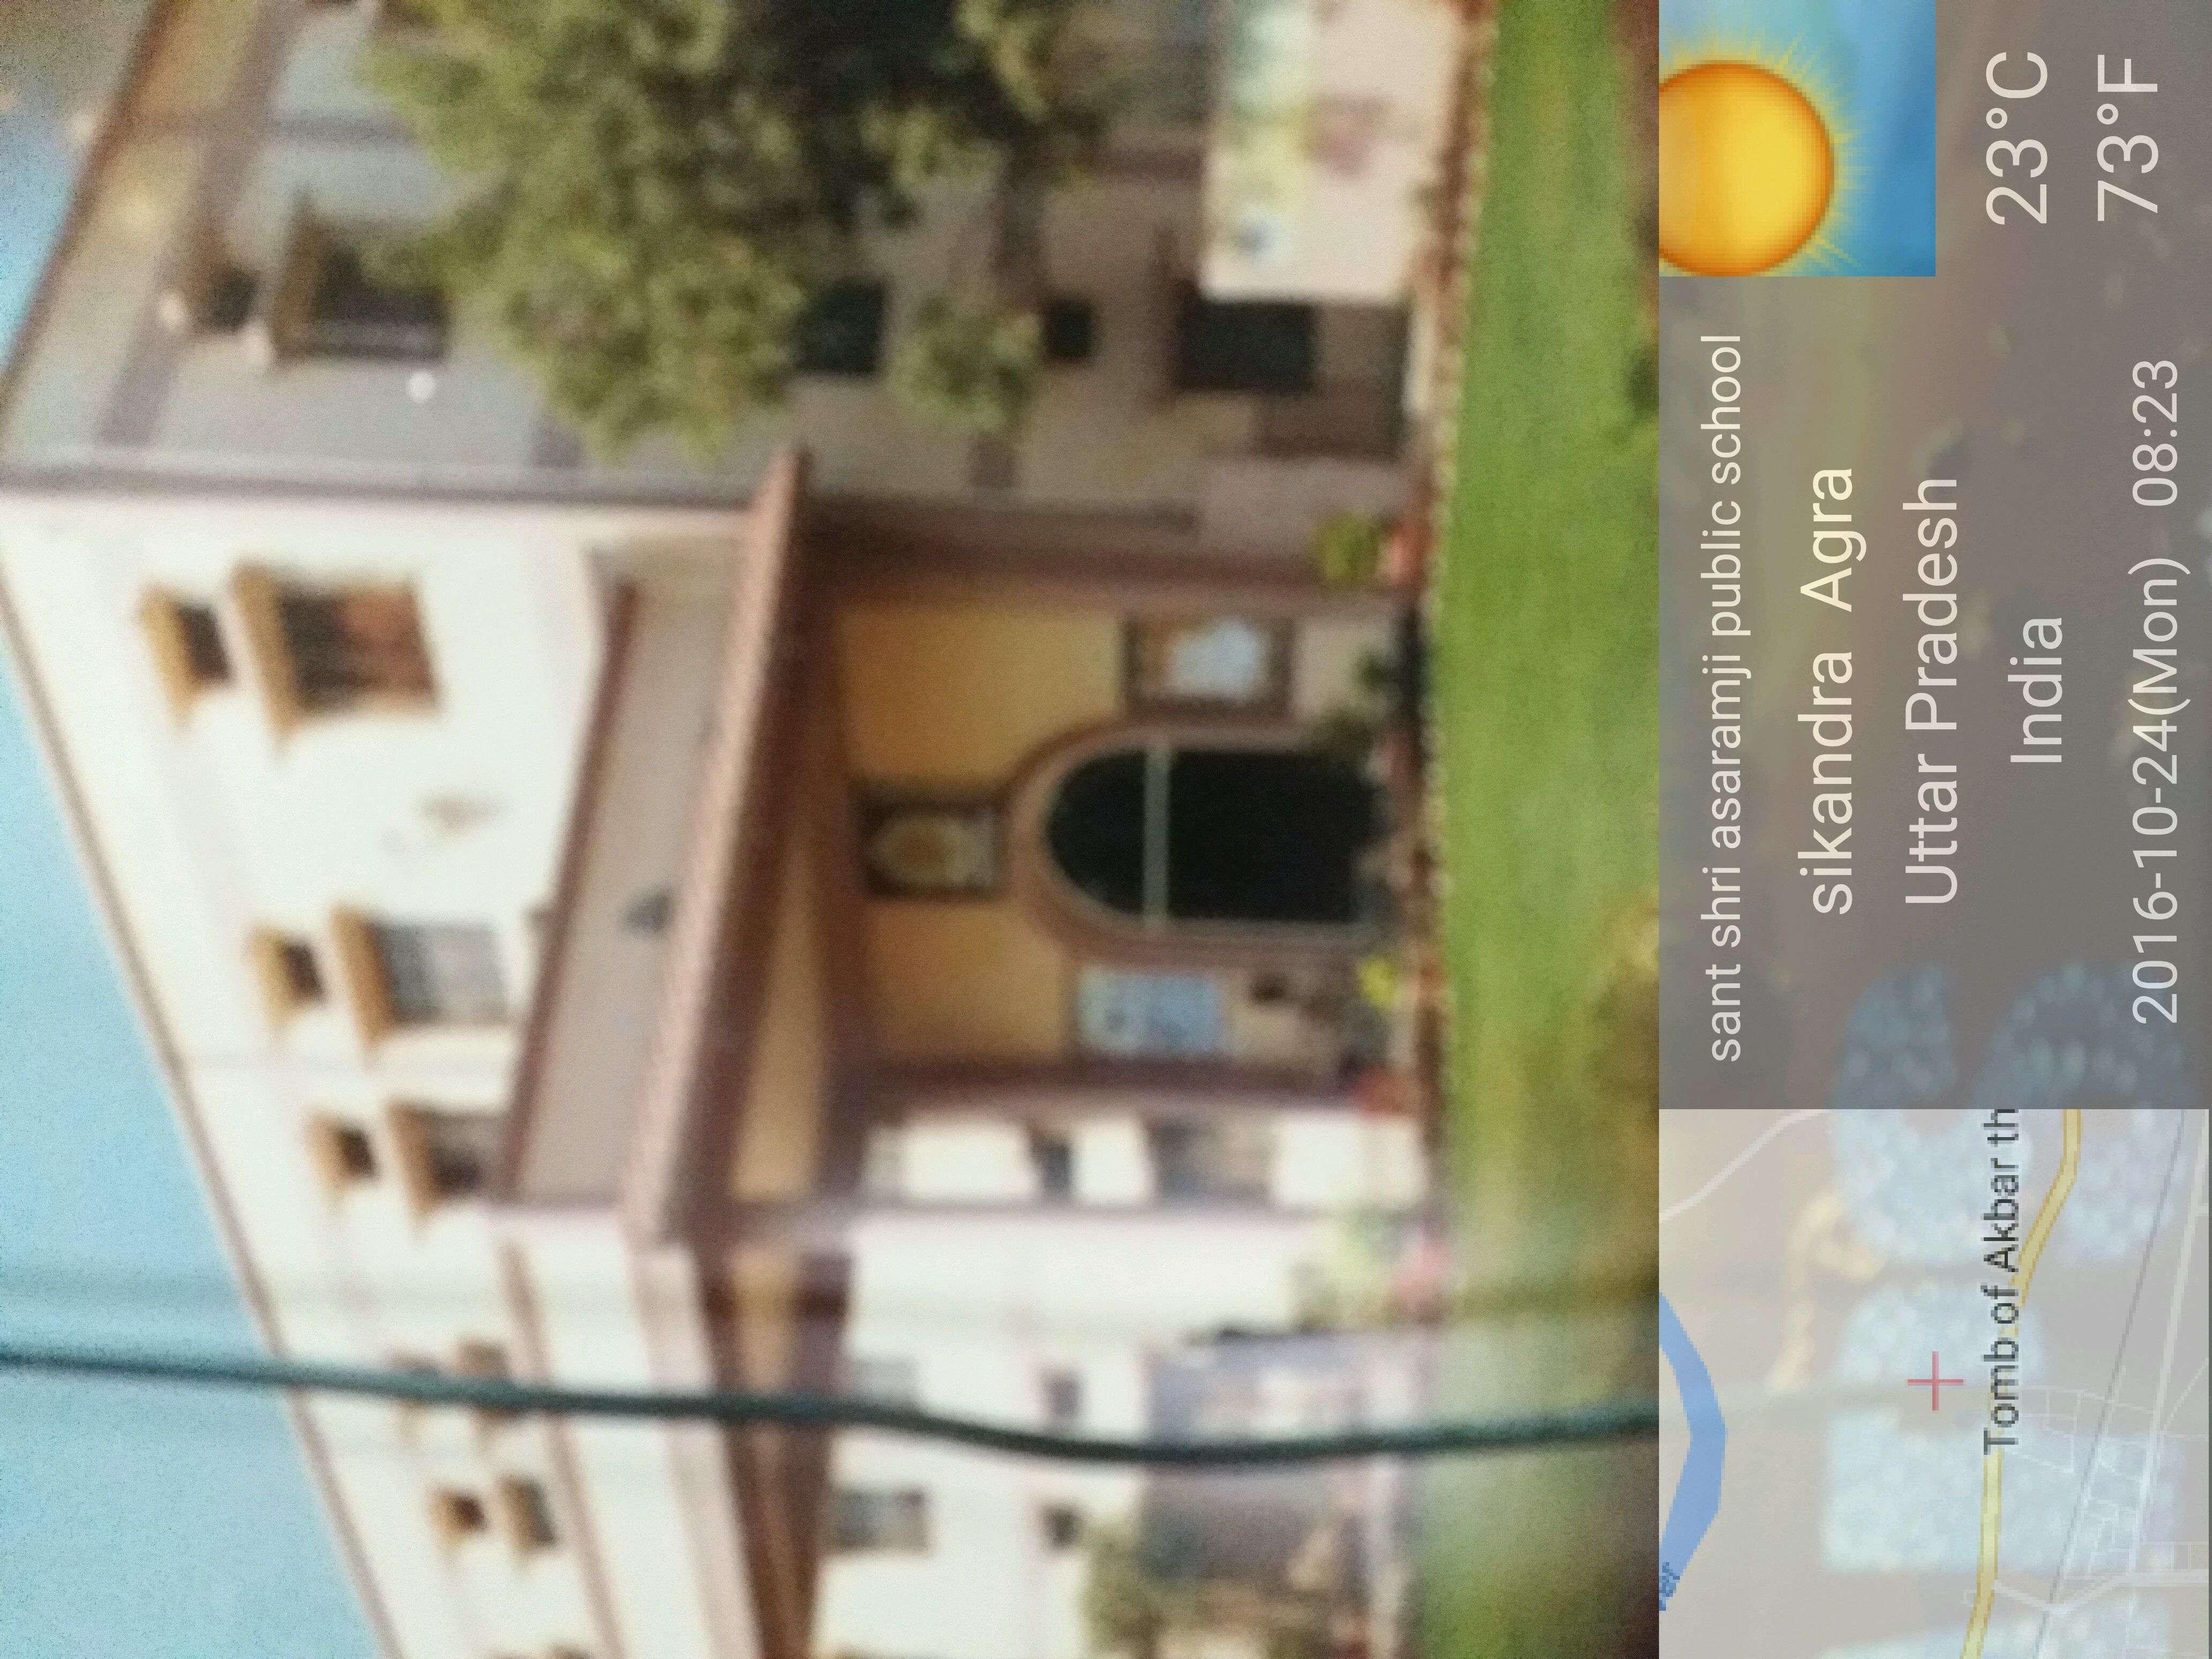 SANT SHRI ASARAMJI PUBLIC SCHOOL MATHURA ROAD SIKANDRA AGRA UP 2130775